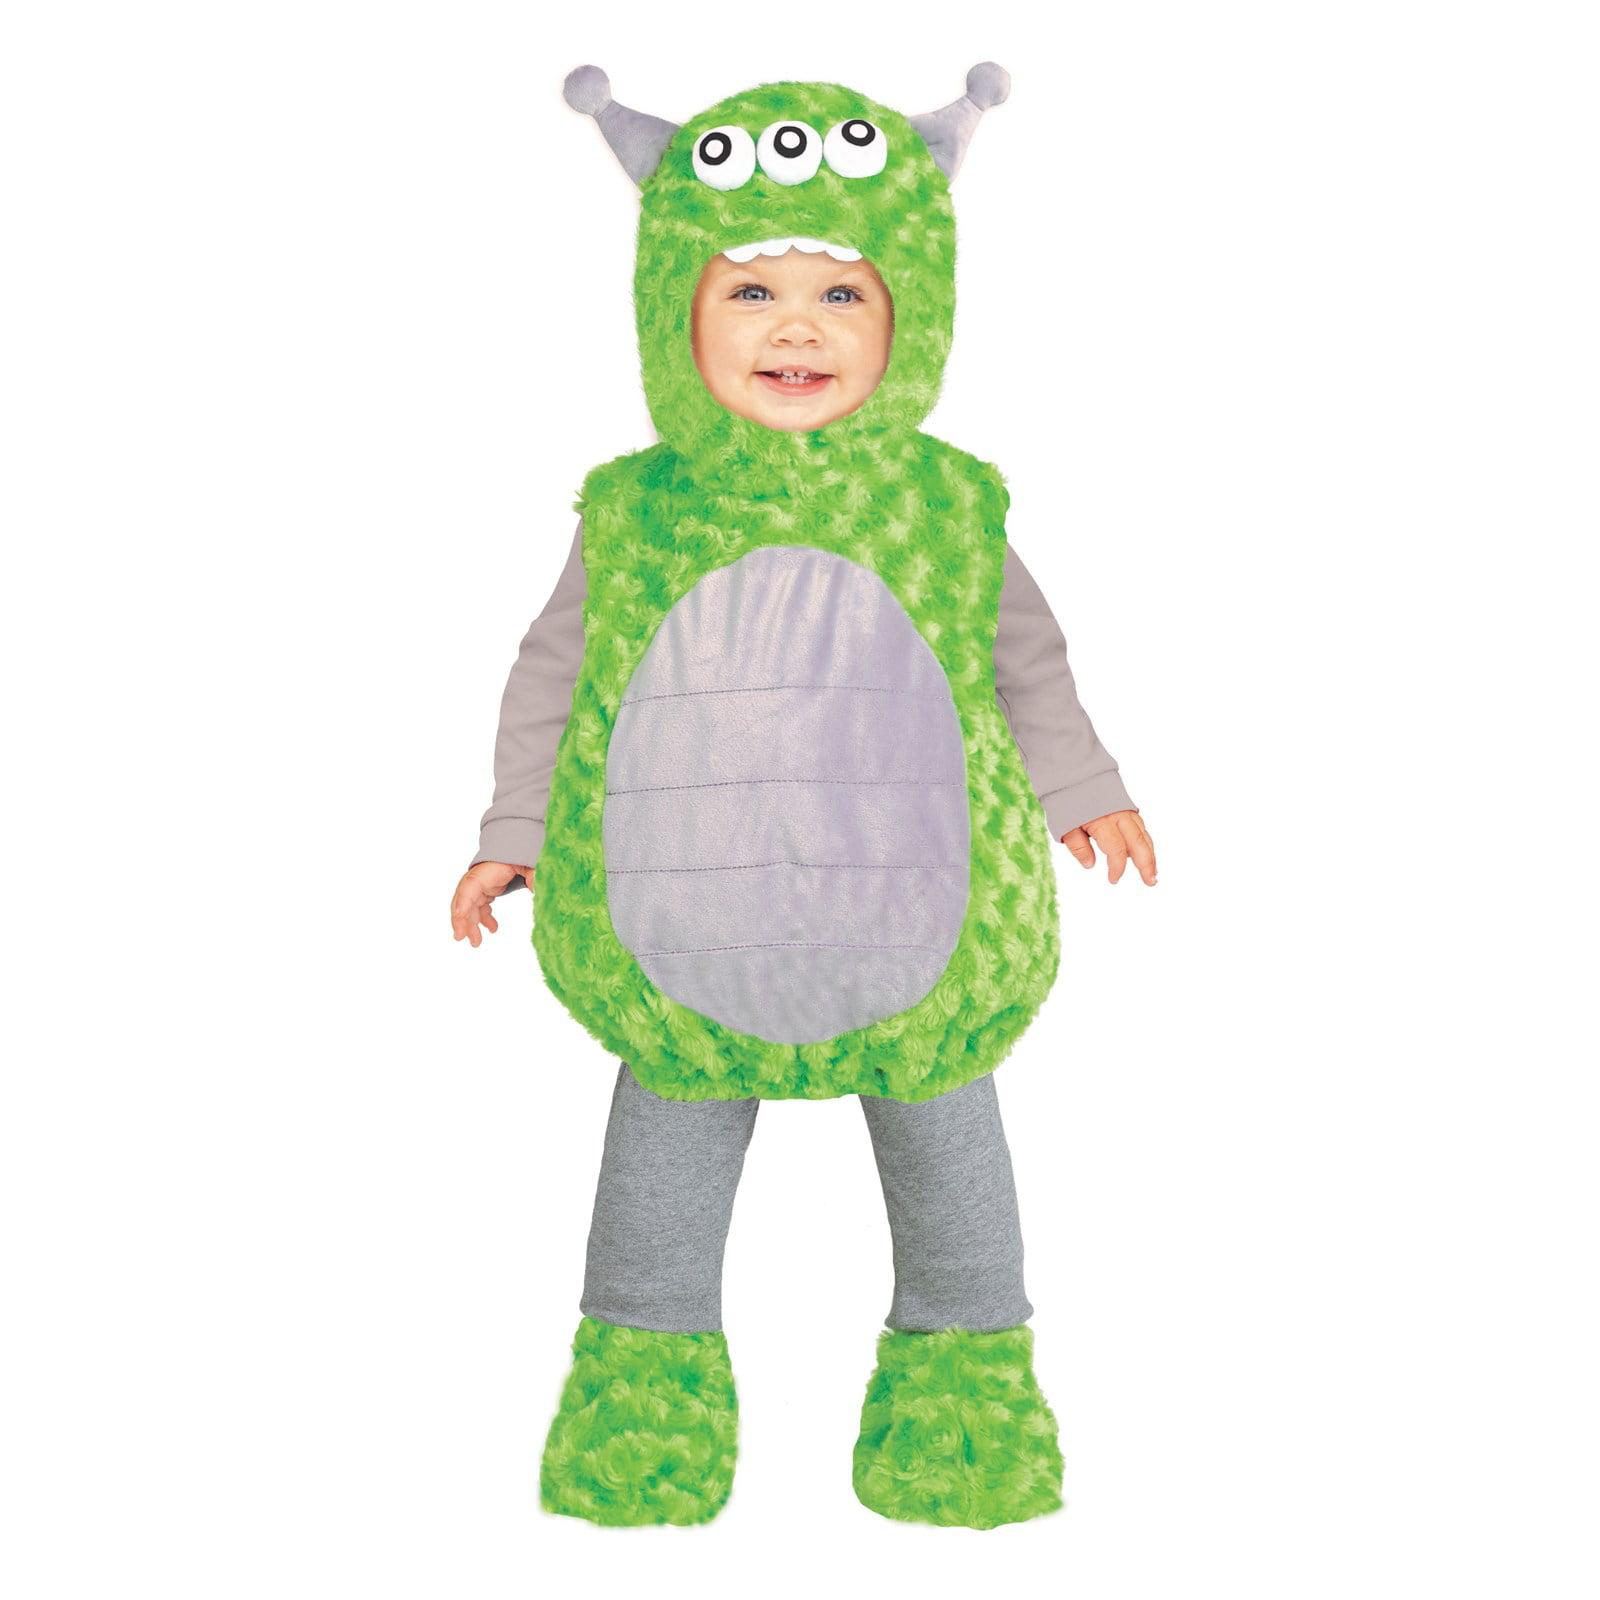 Lil' Alien Infant Costume